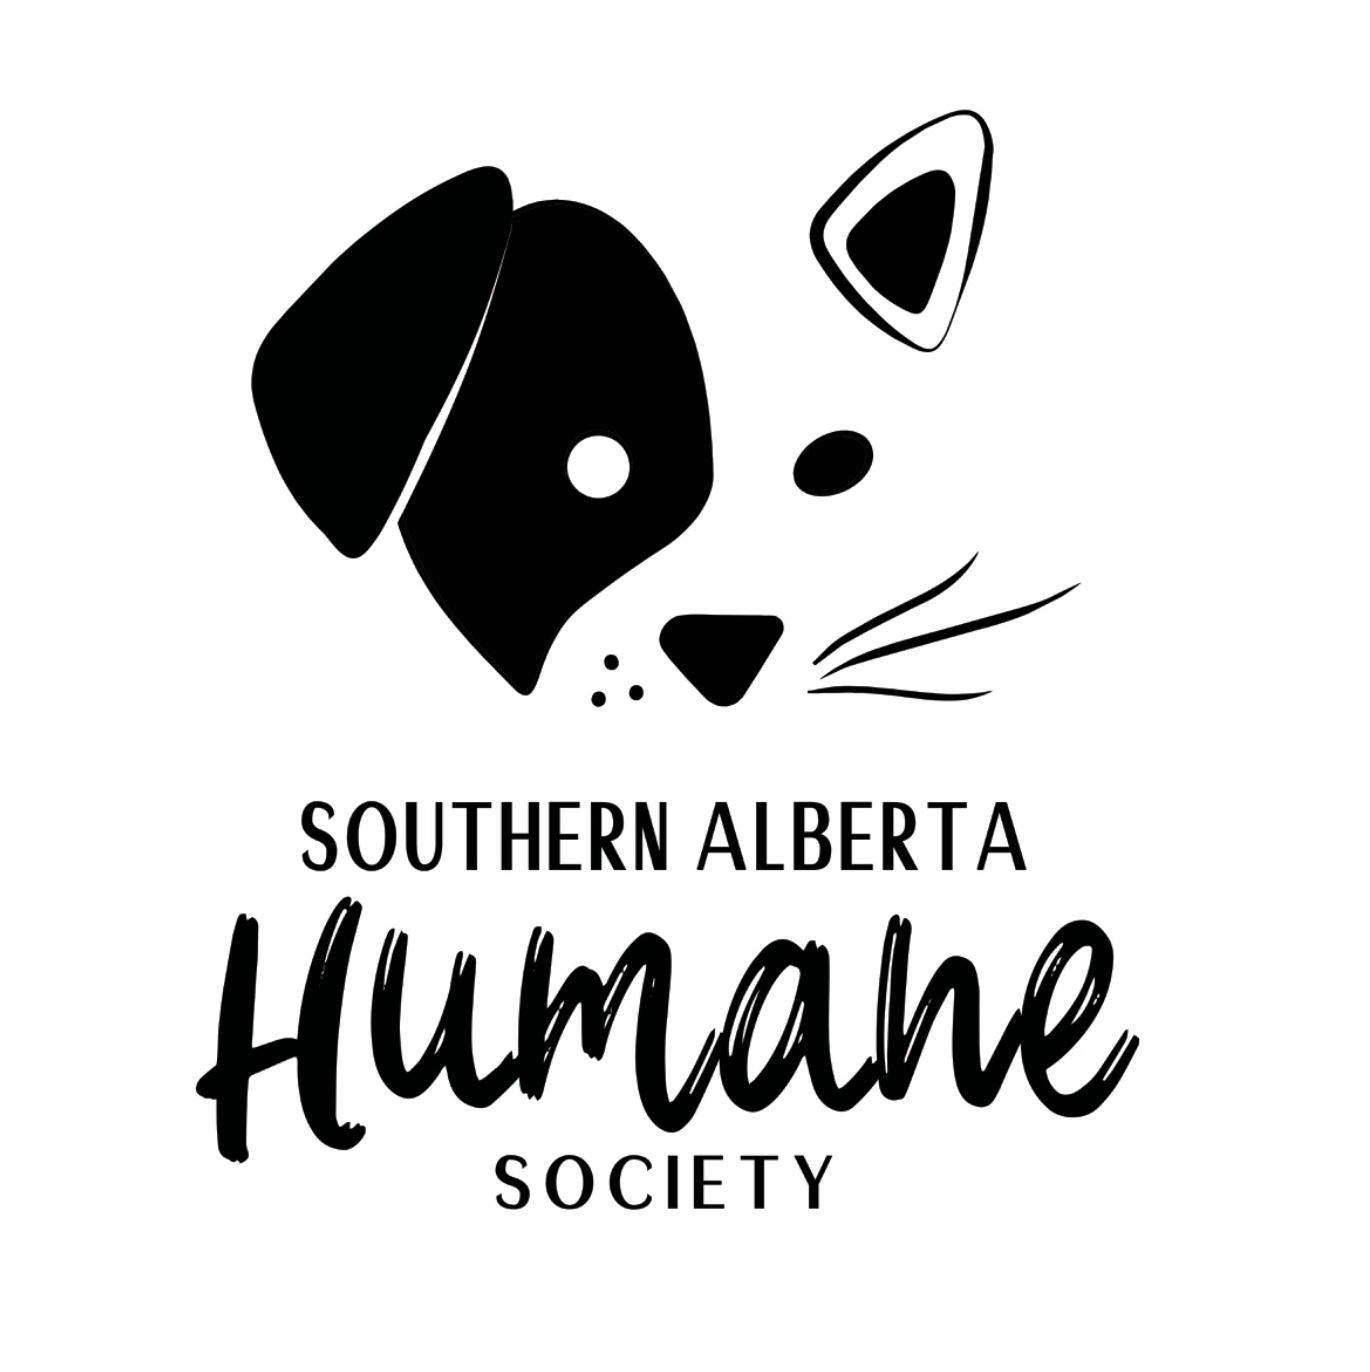 Southern Alberta Humane Society